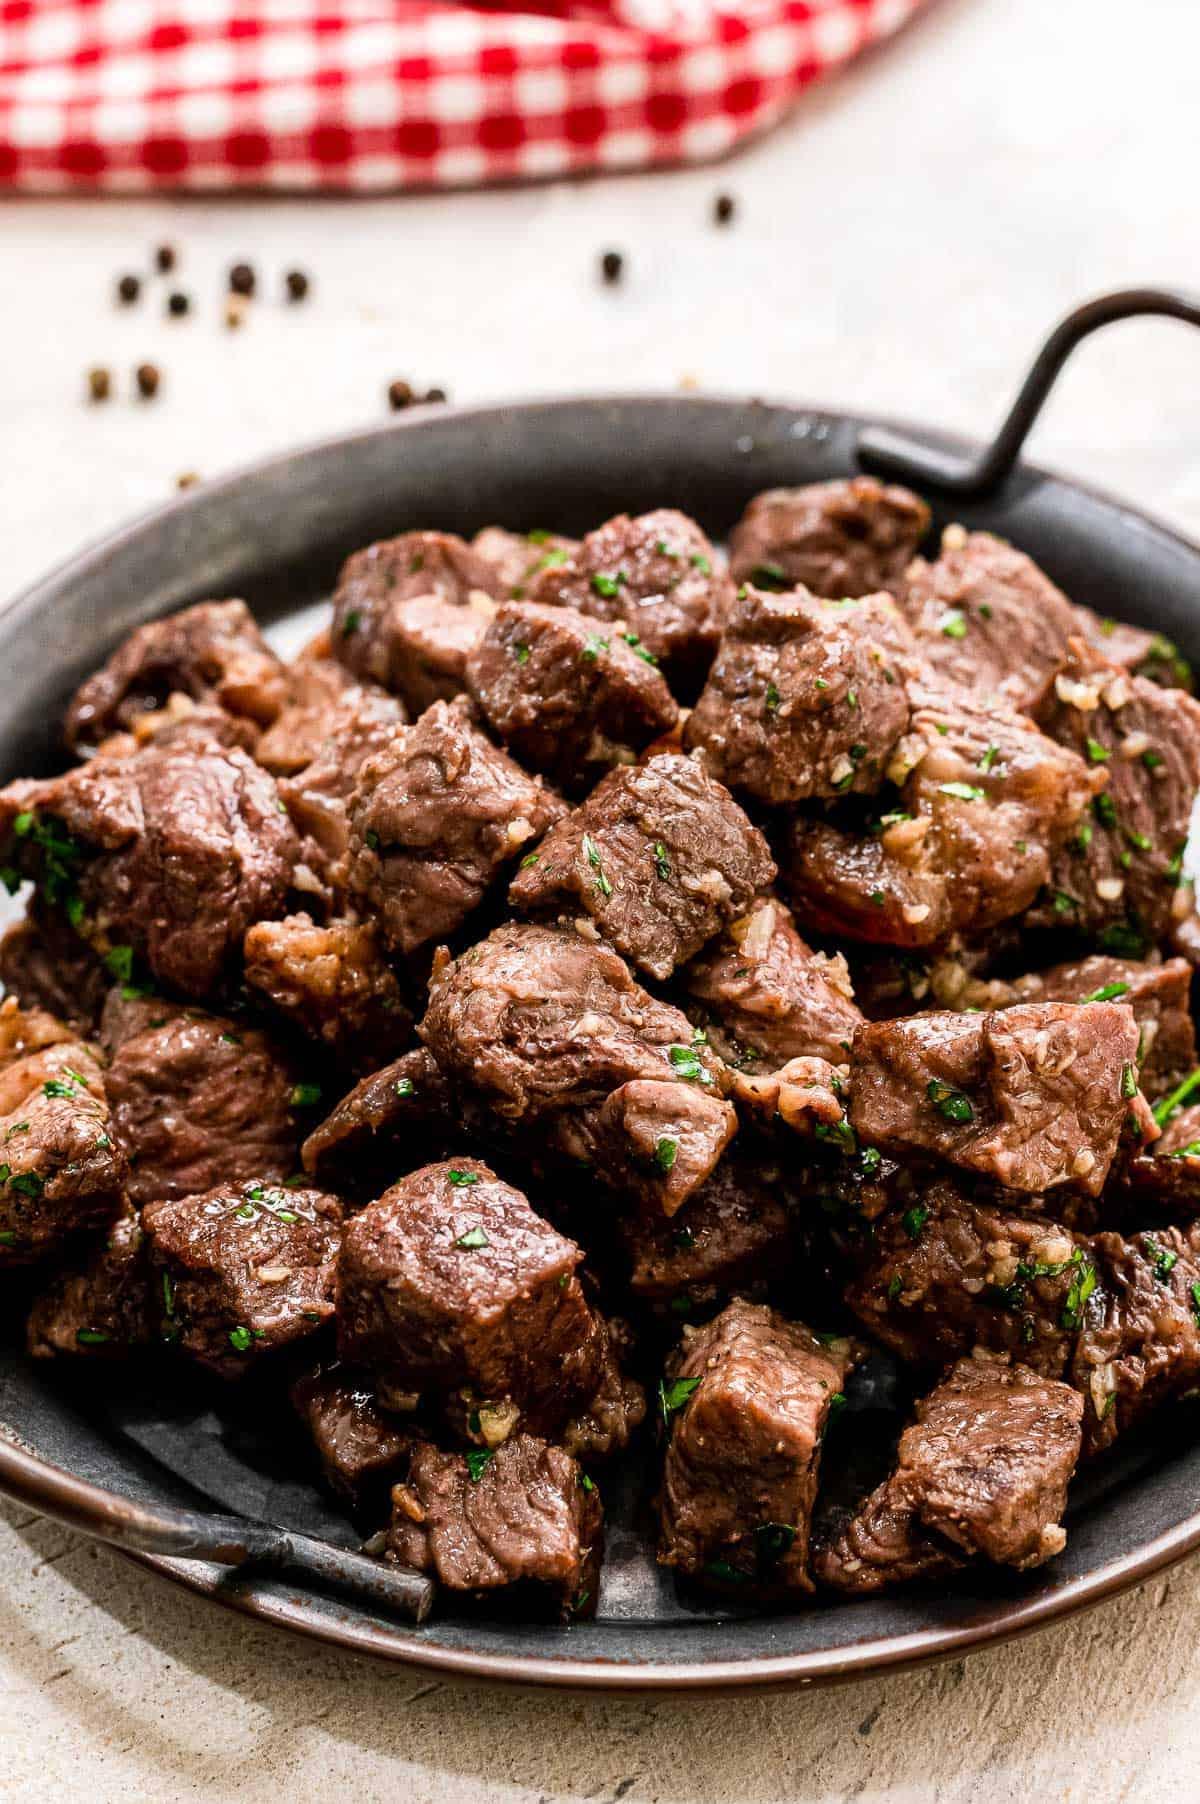 Steak Bites with Garlic Butter on black serving platter